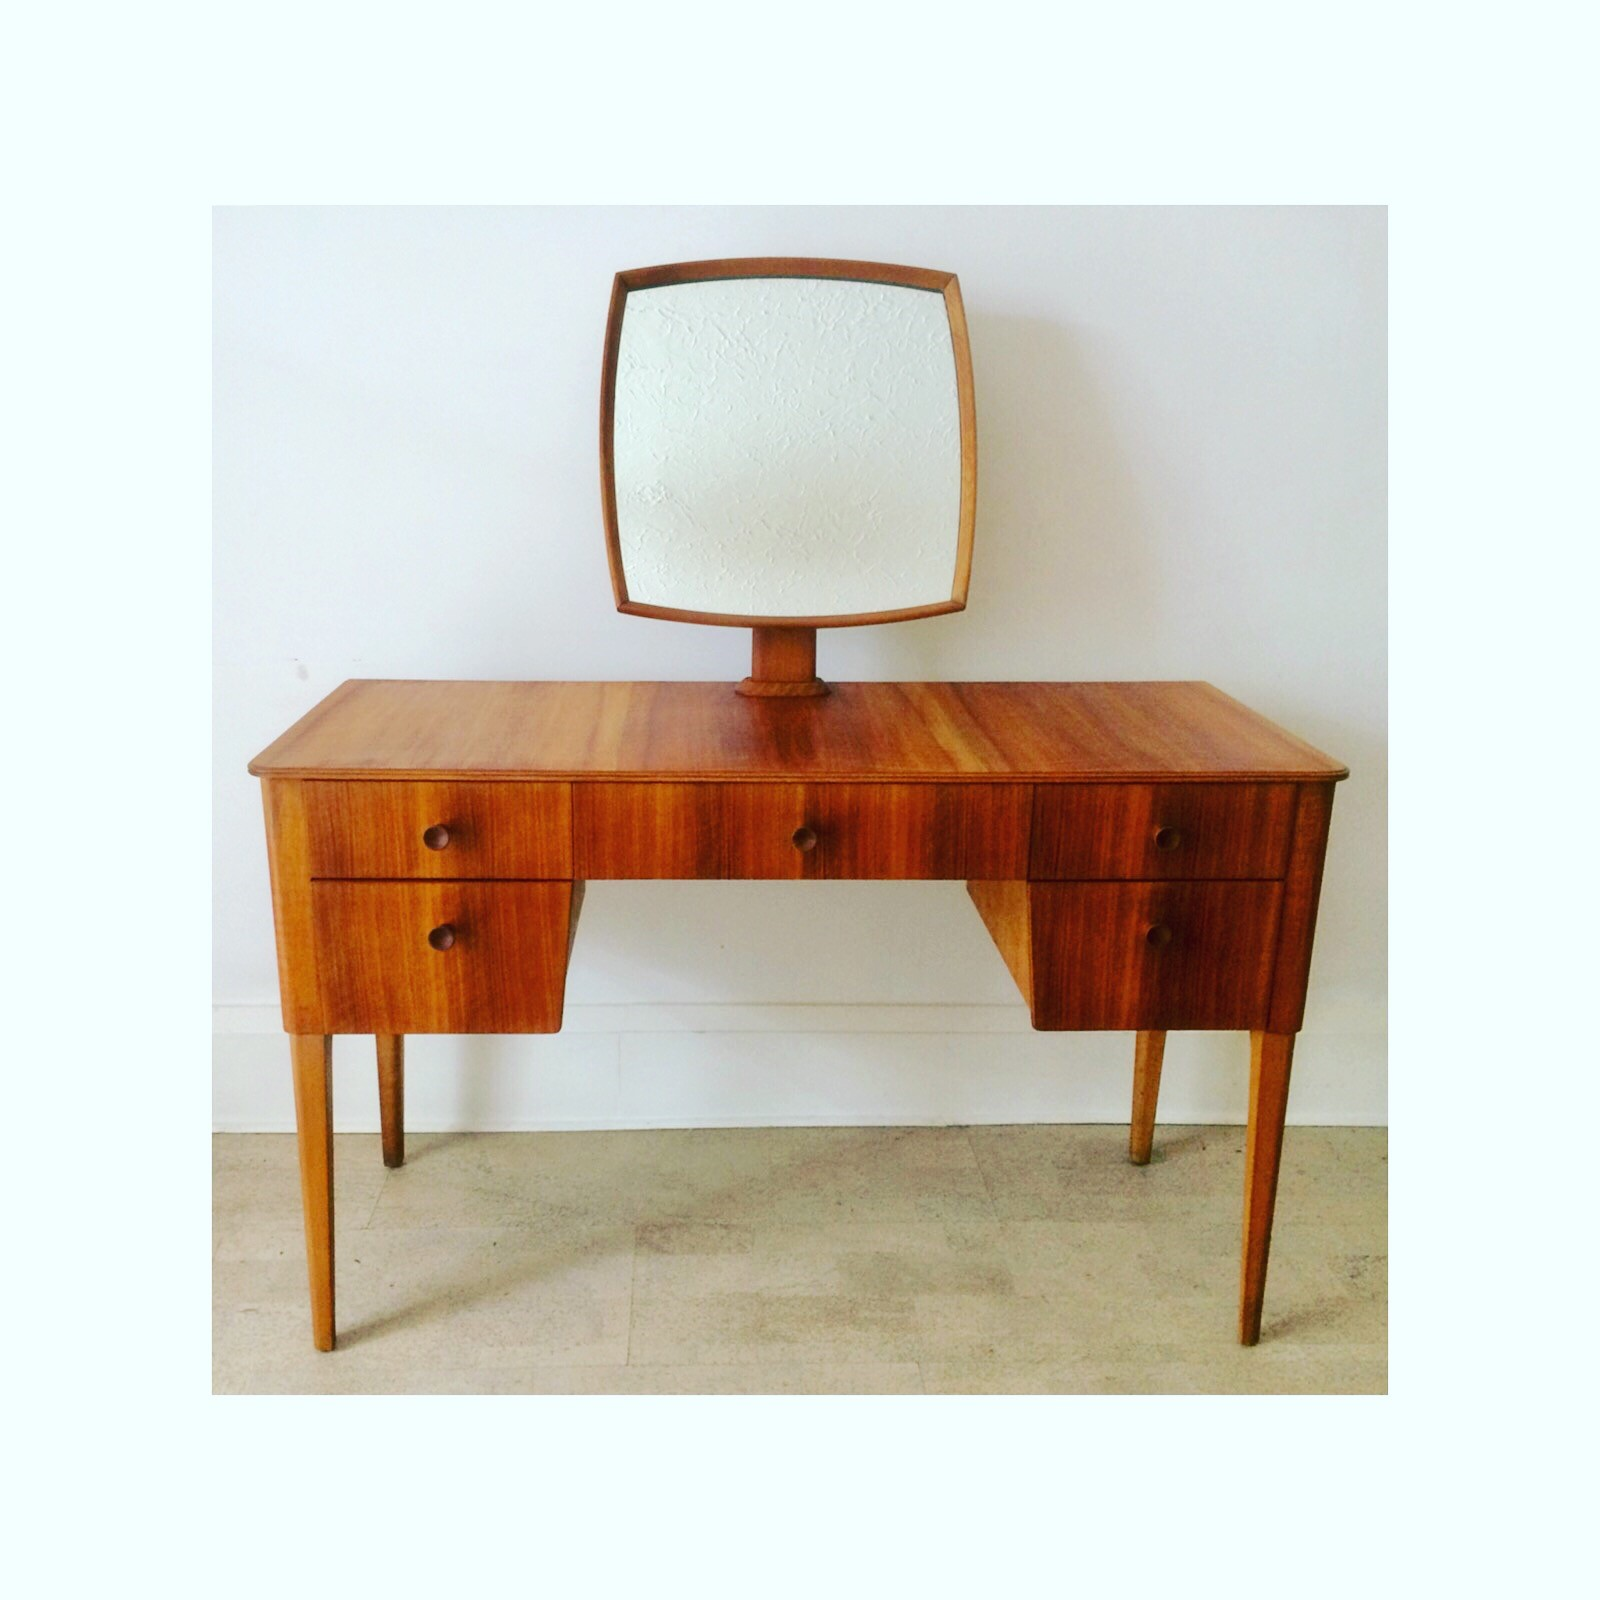 Gordon Russell Dressing Table.jpg